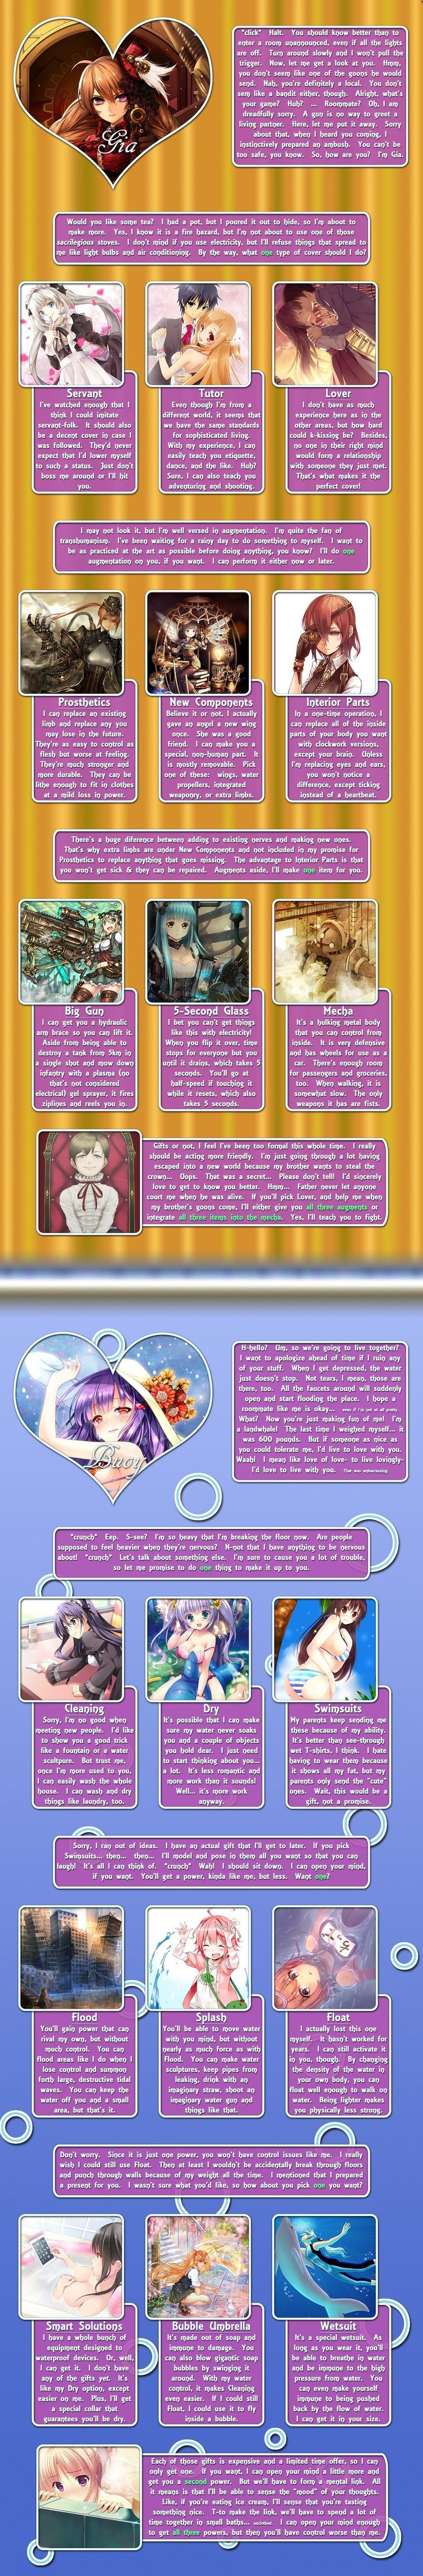 Branching Heart CYOA From tg Anime Cyoa Dead king King